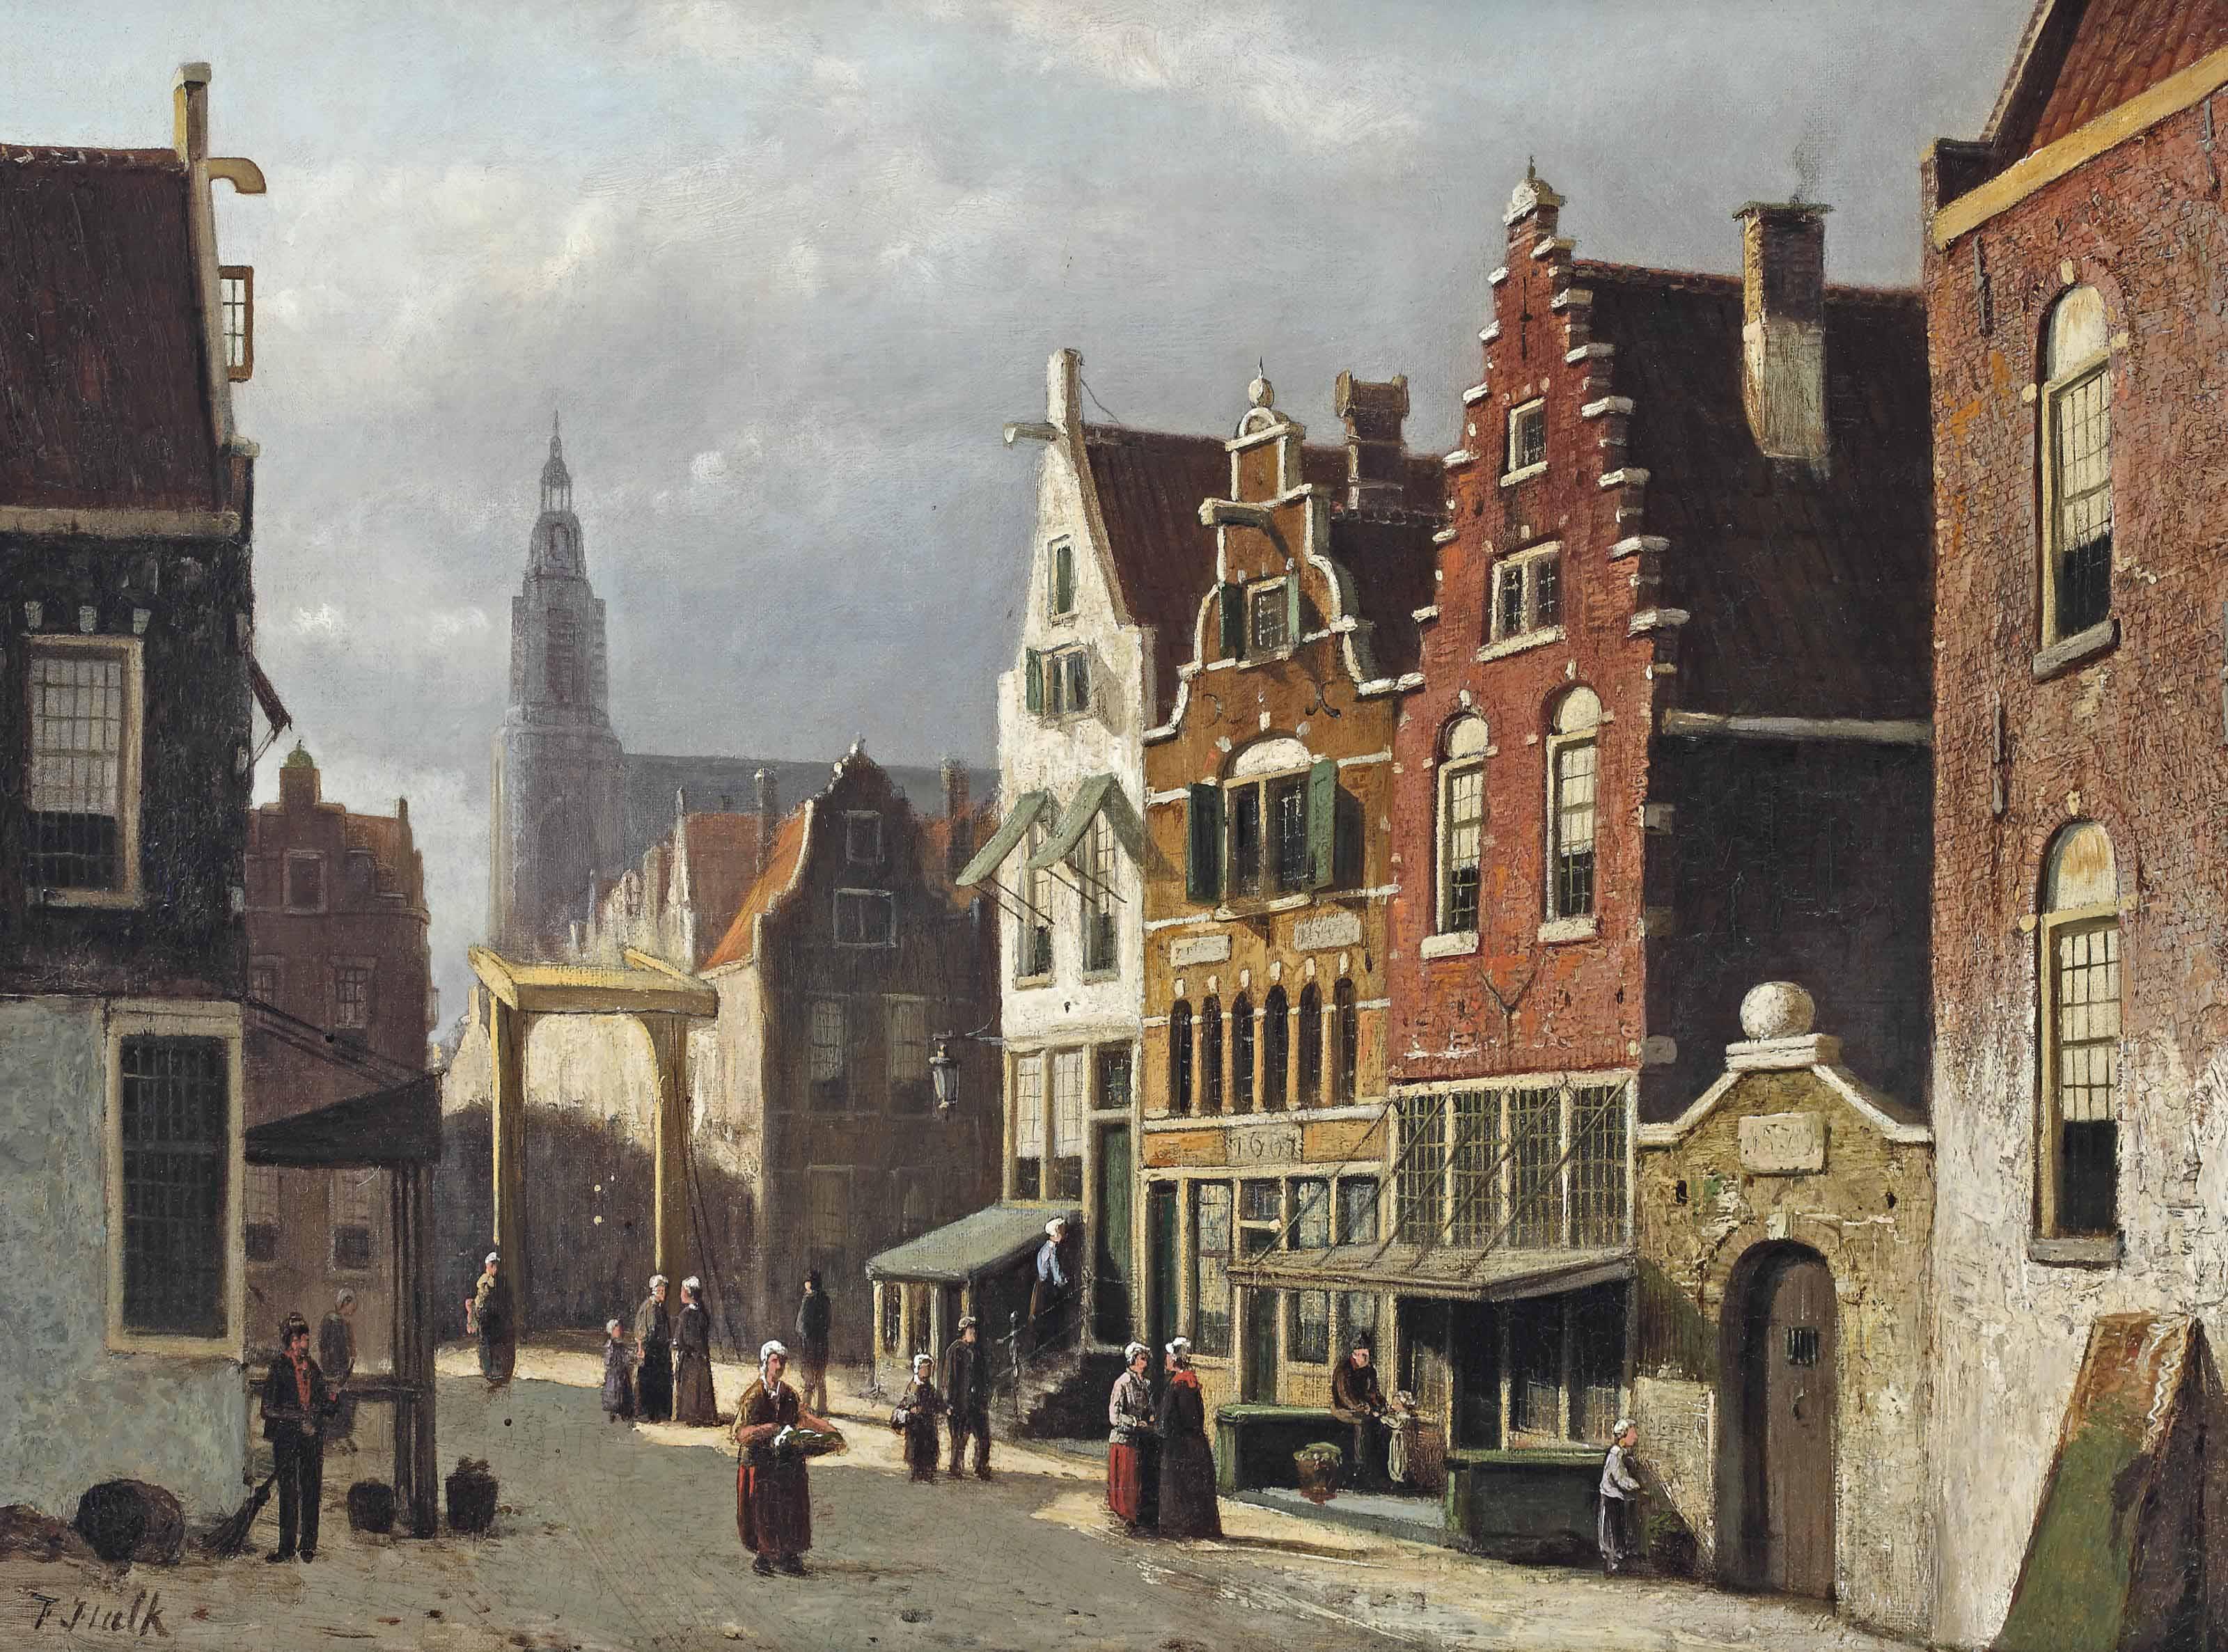 A sunlit street in a Dutch town